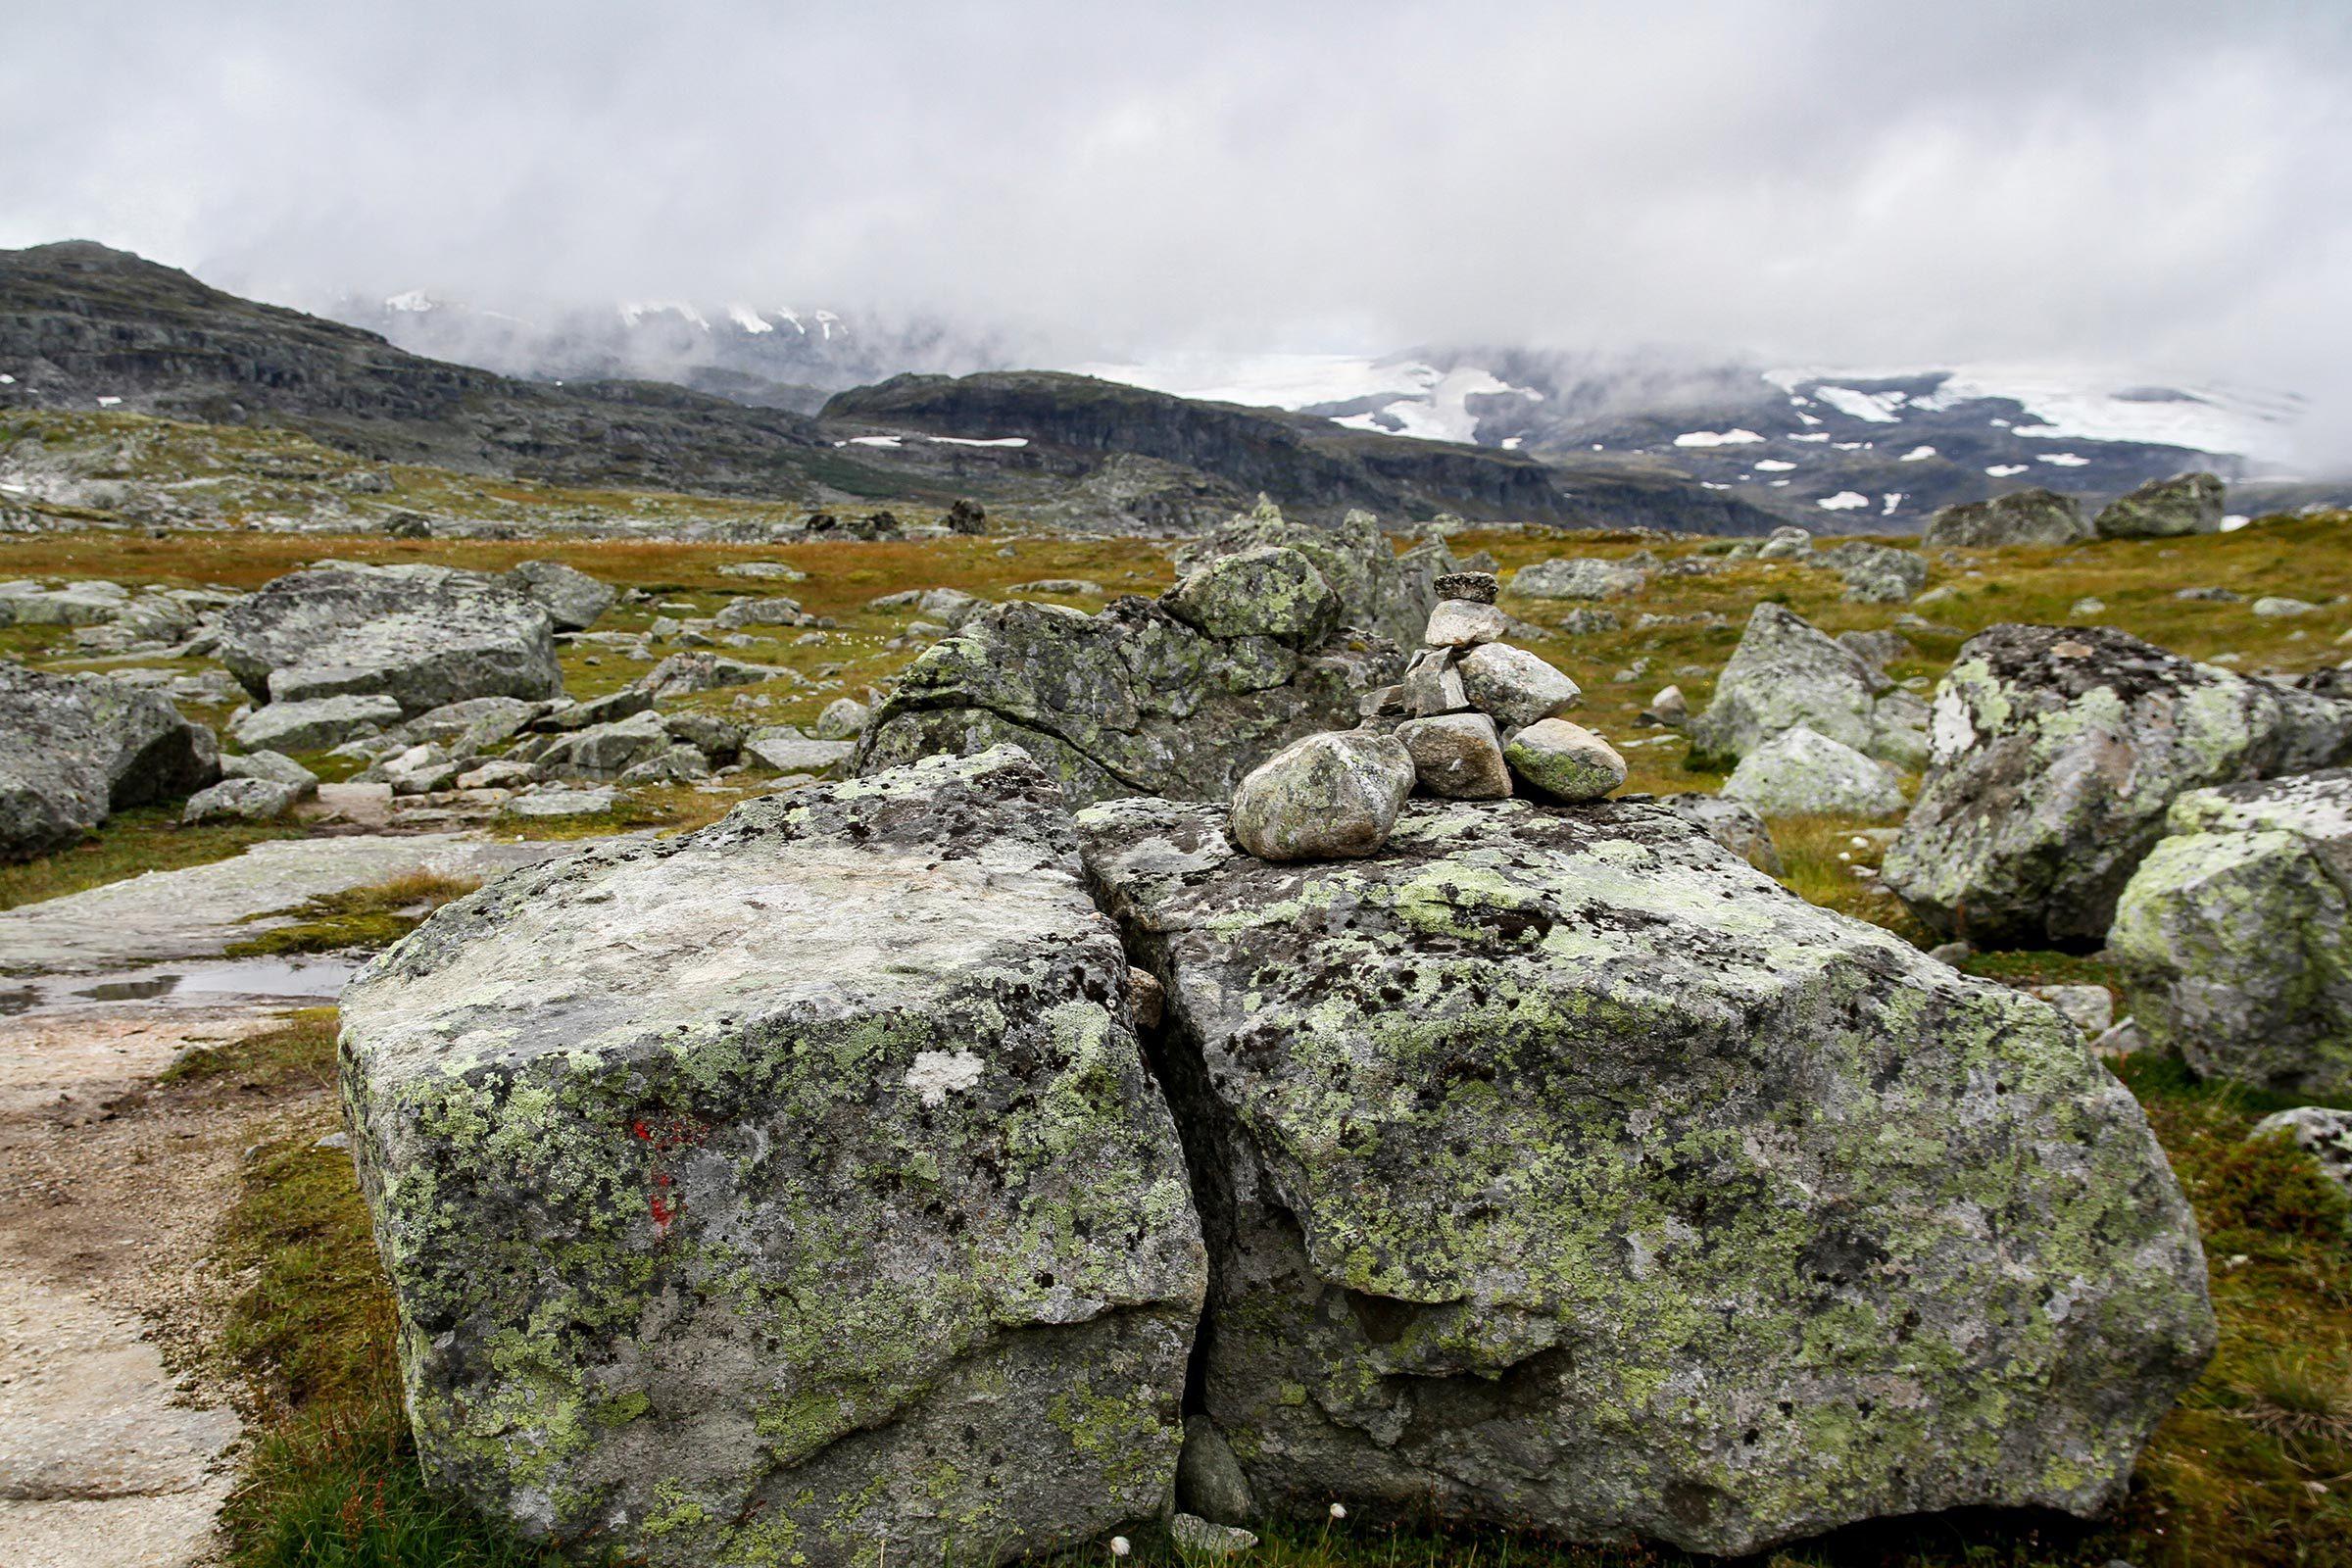 Finse, Hardangervidda, National Park in Norway